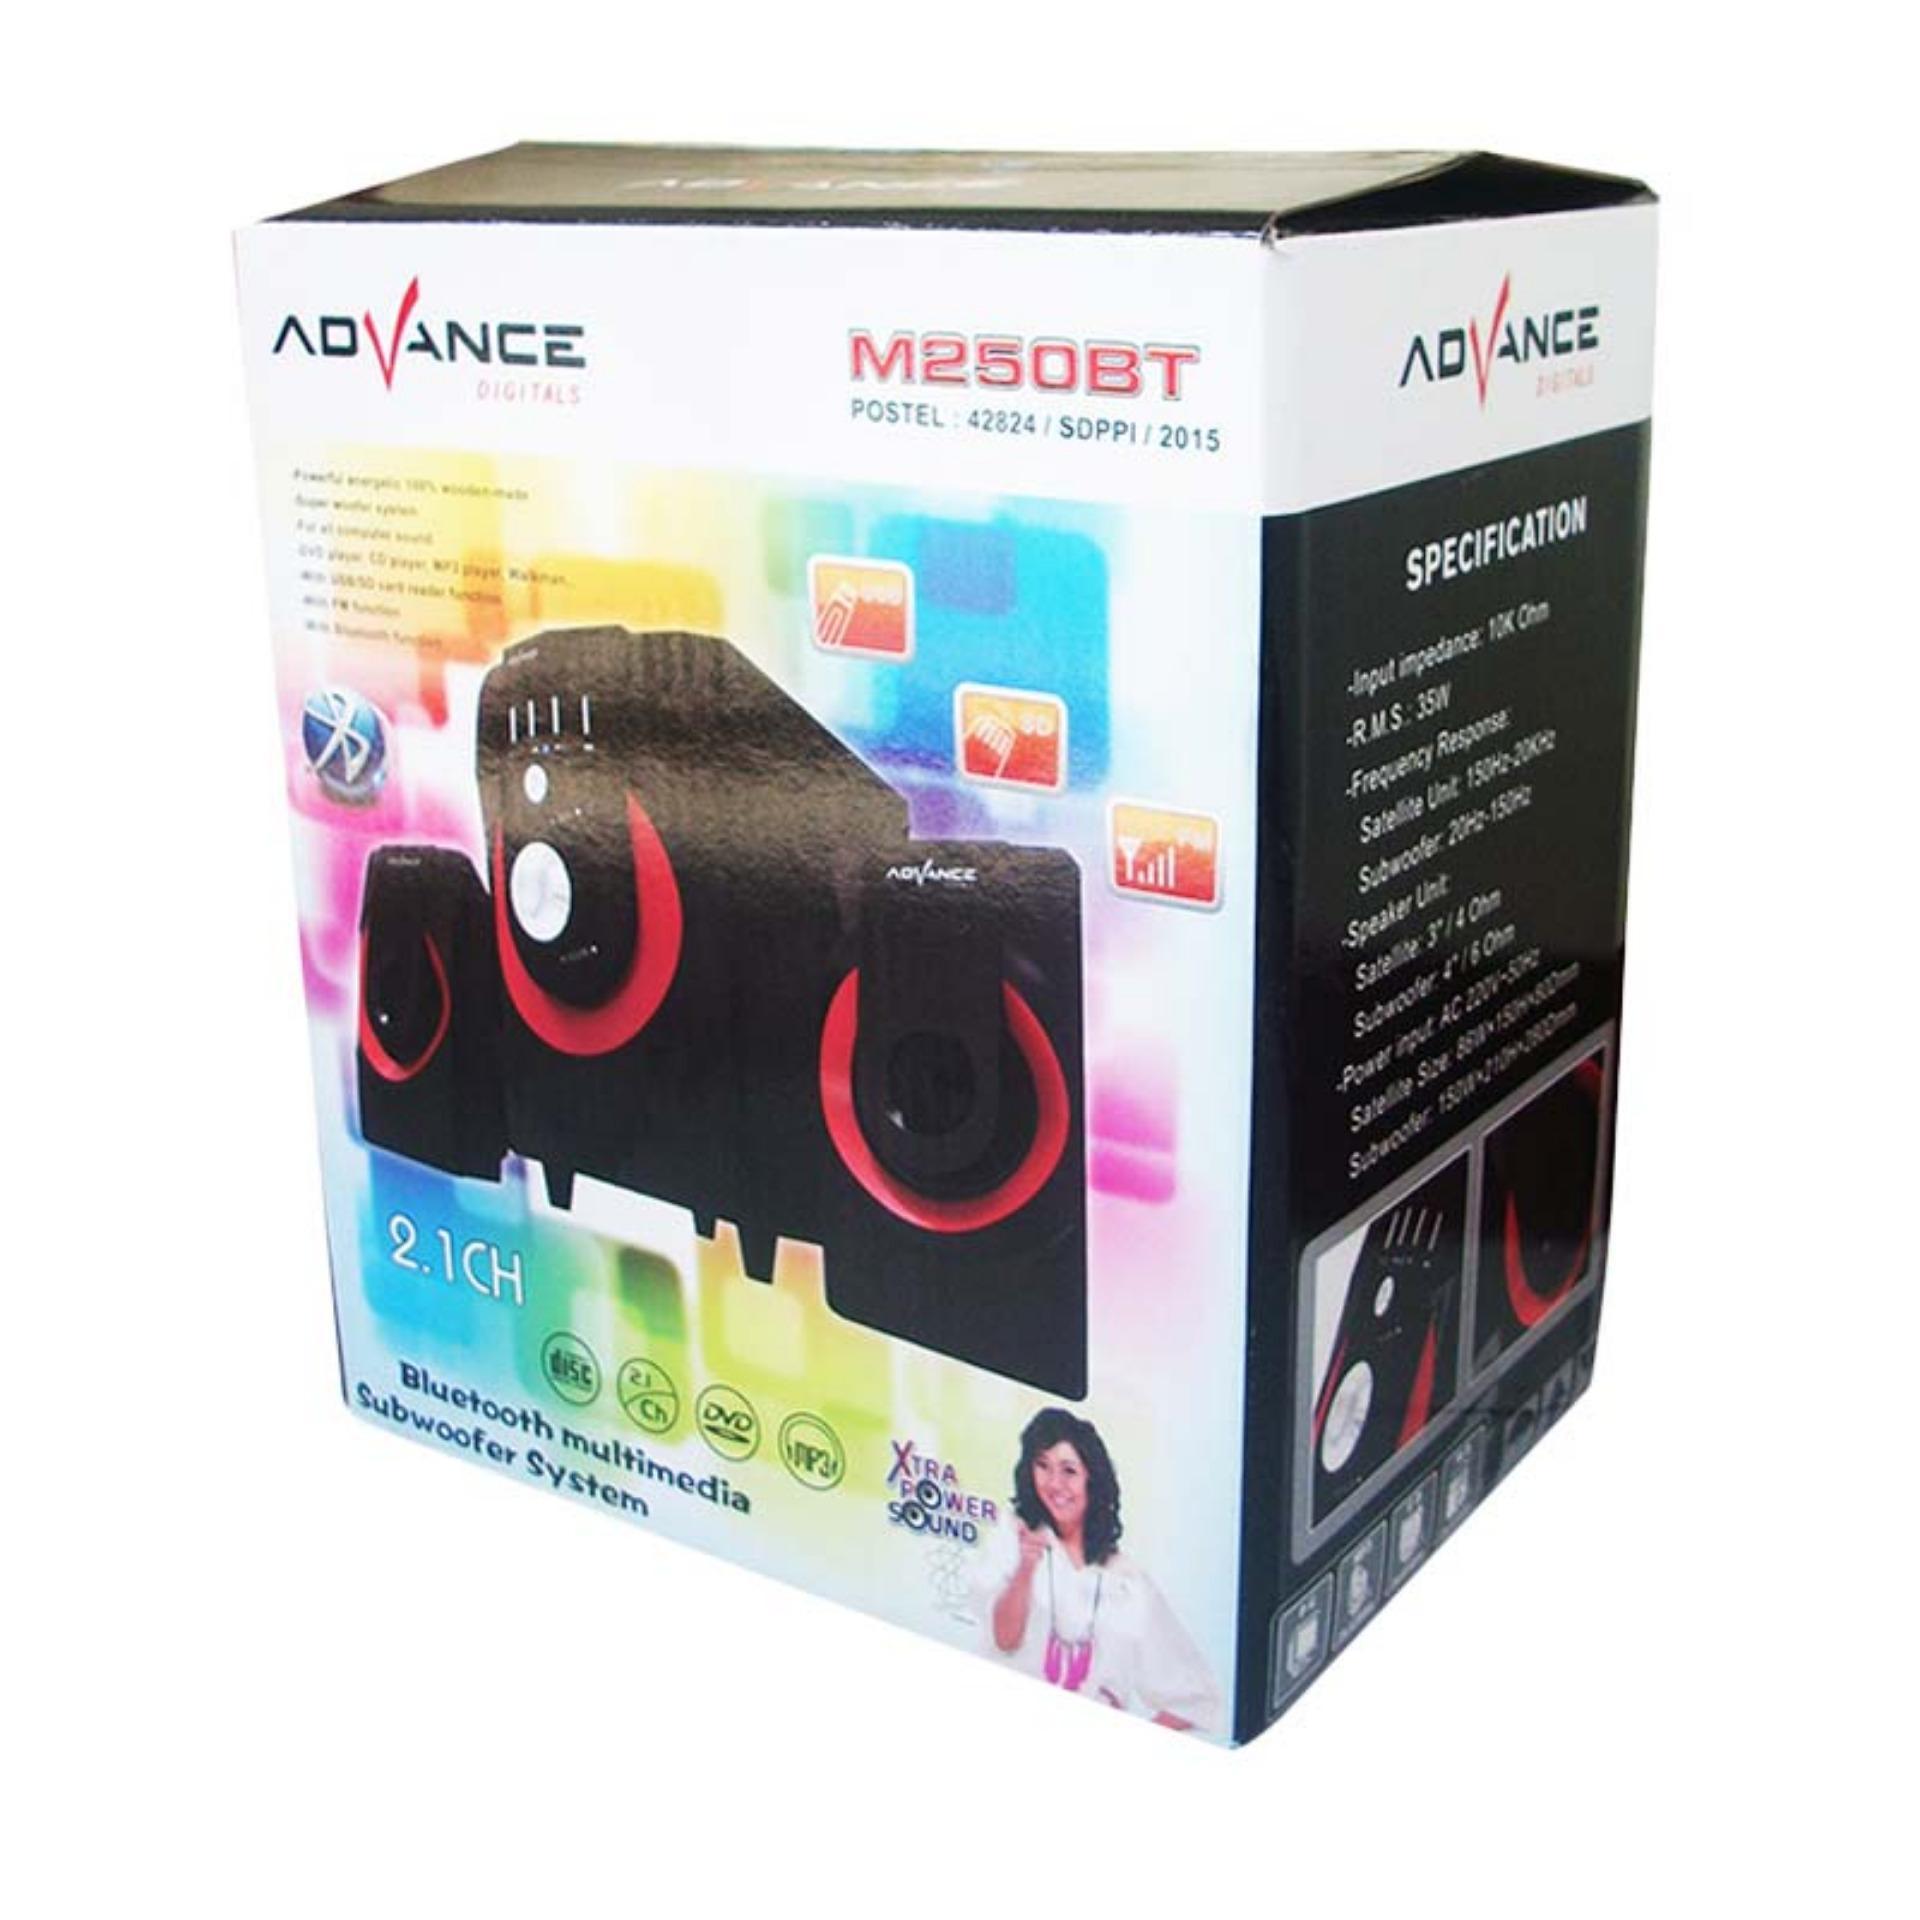 SP Advance M250BT Bluetooth Speaker - Hitam RED [Subwoofer System] .